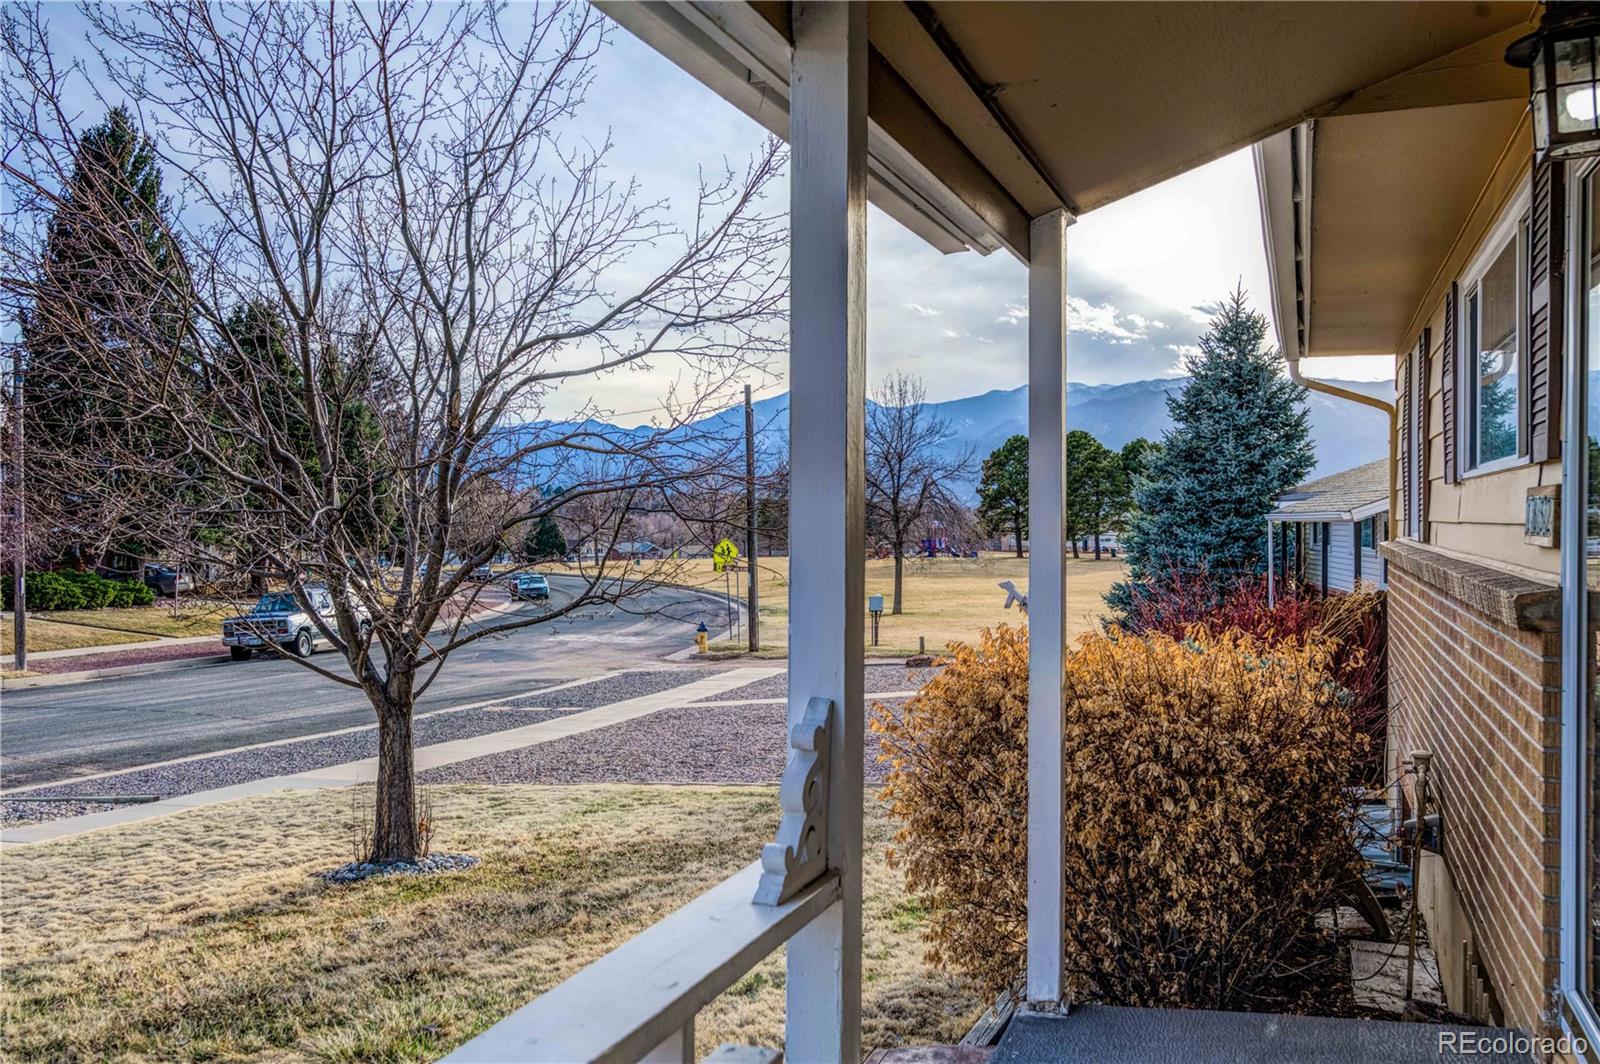 MLS# 5043109 - 4 - 1832 Northview Drive, Colorado Springs, CO 80909